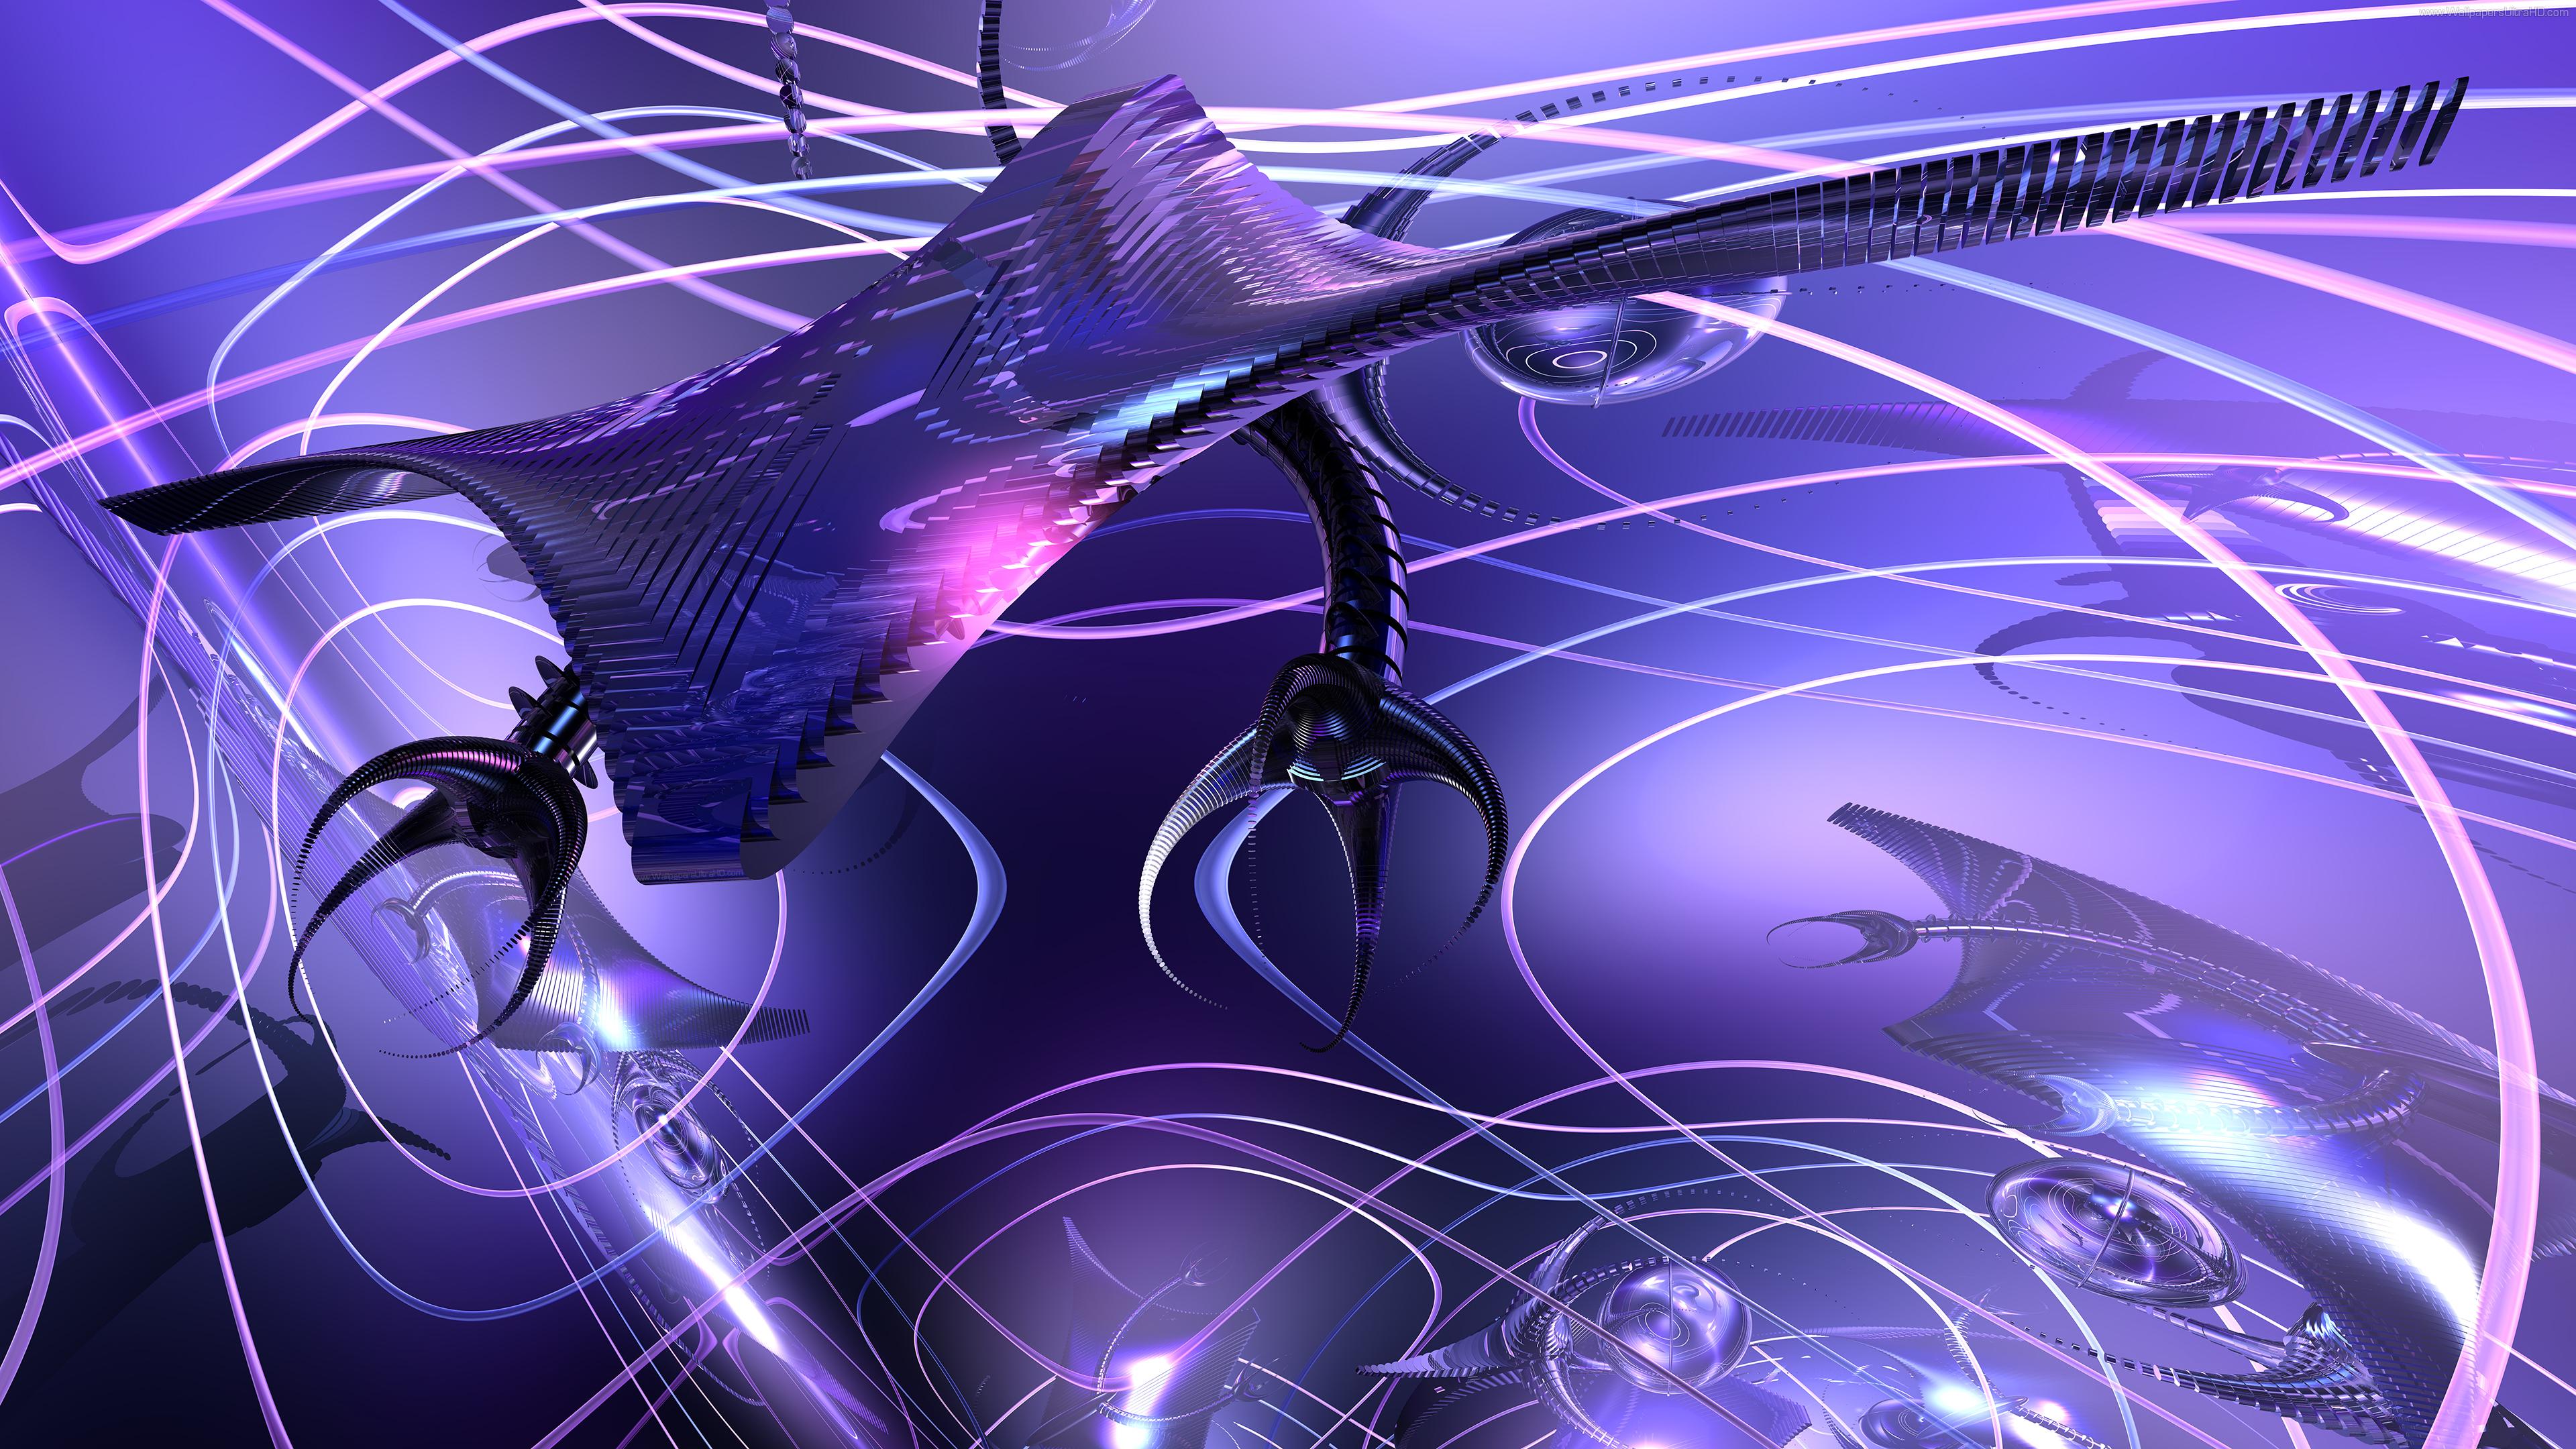 Wallpaper Robo Drone 4K version